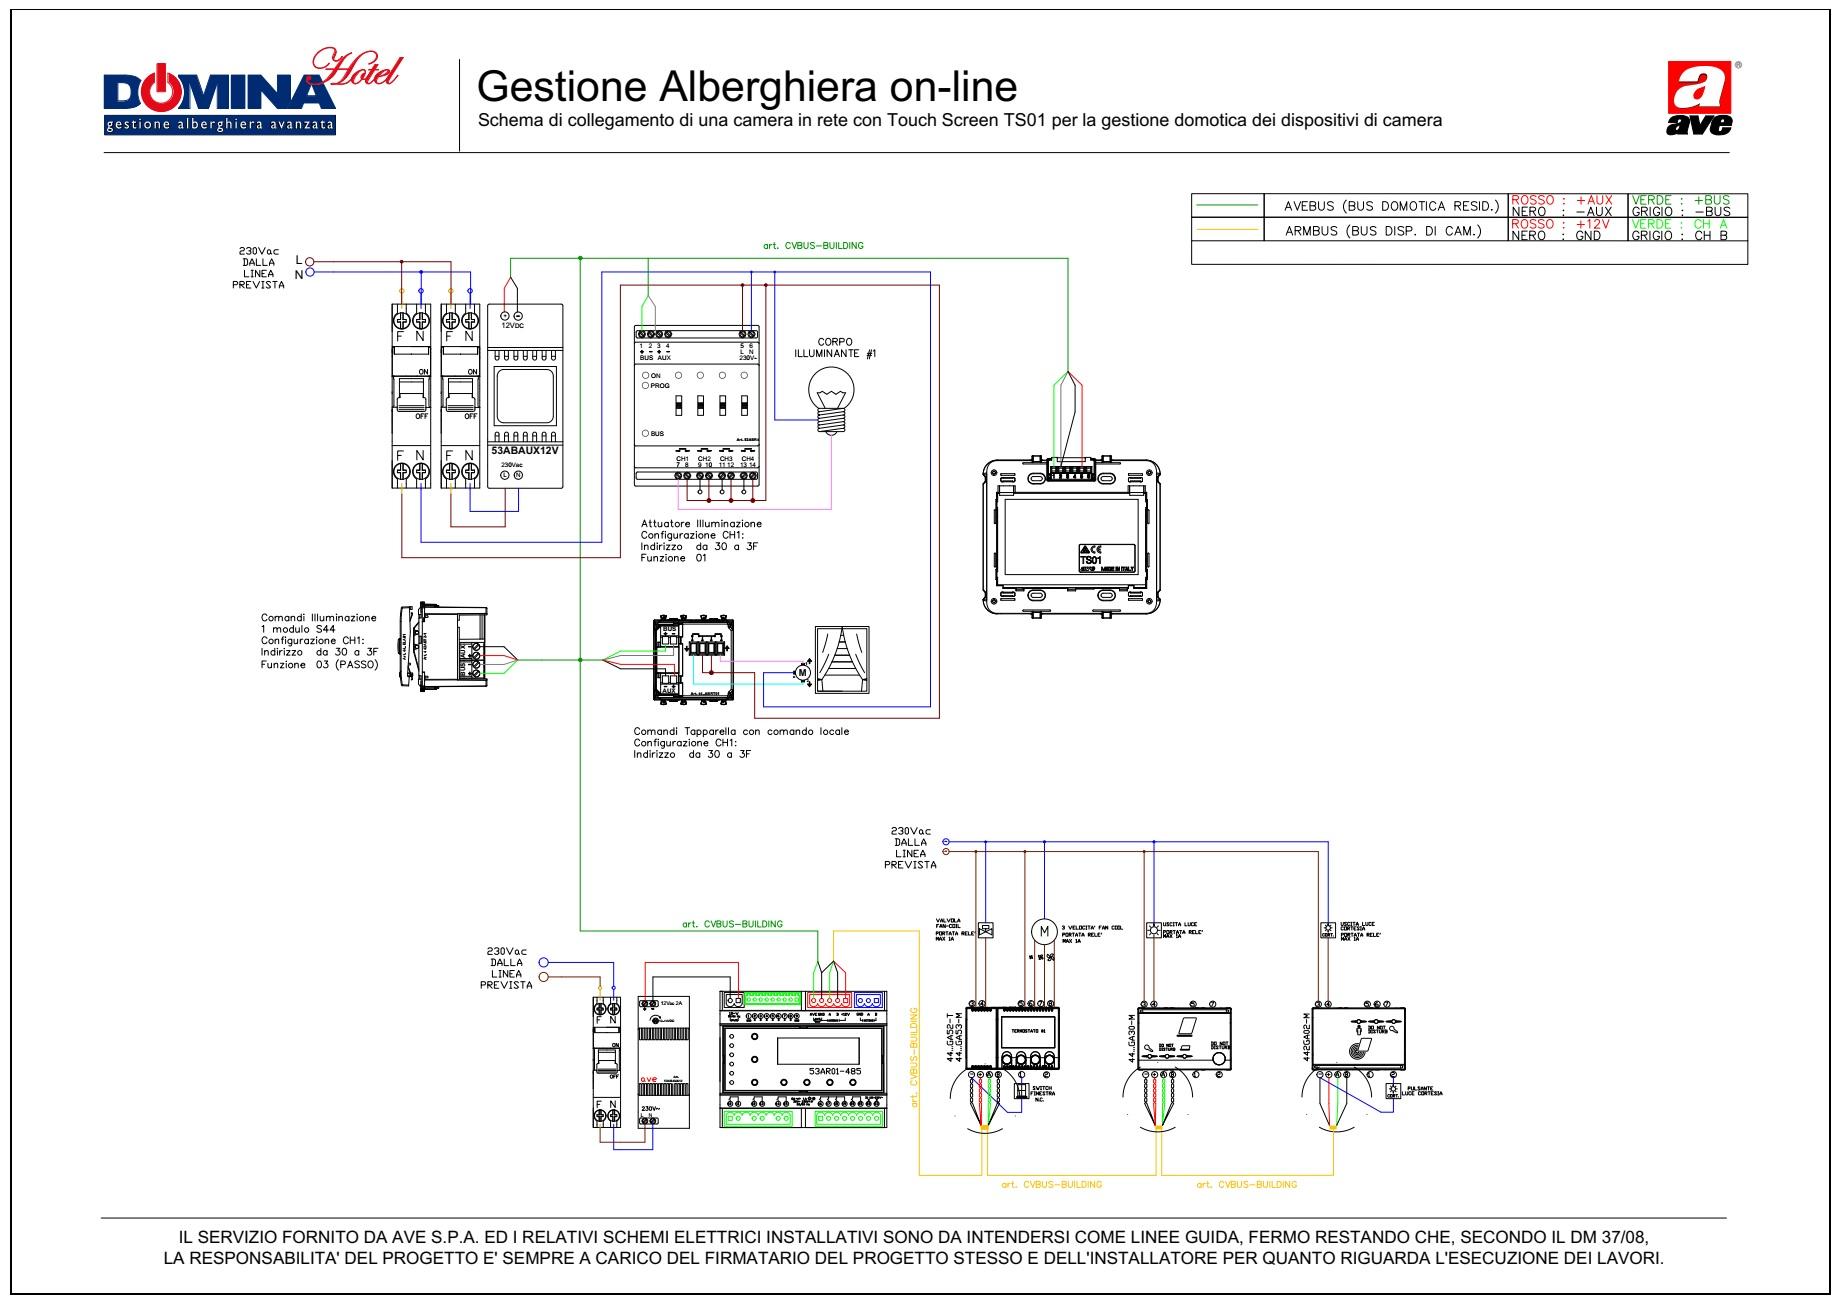 Gestione Alberghiera on-line - gestione domotica con TS01 in camera